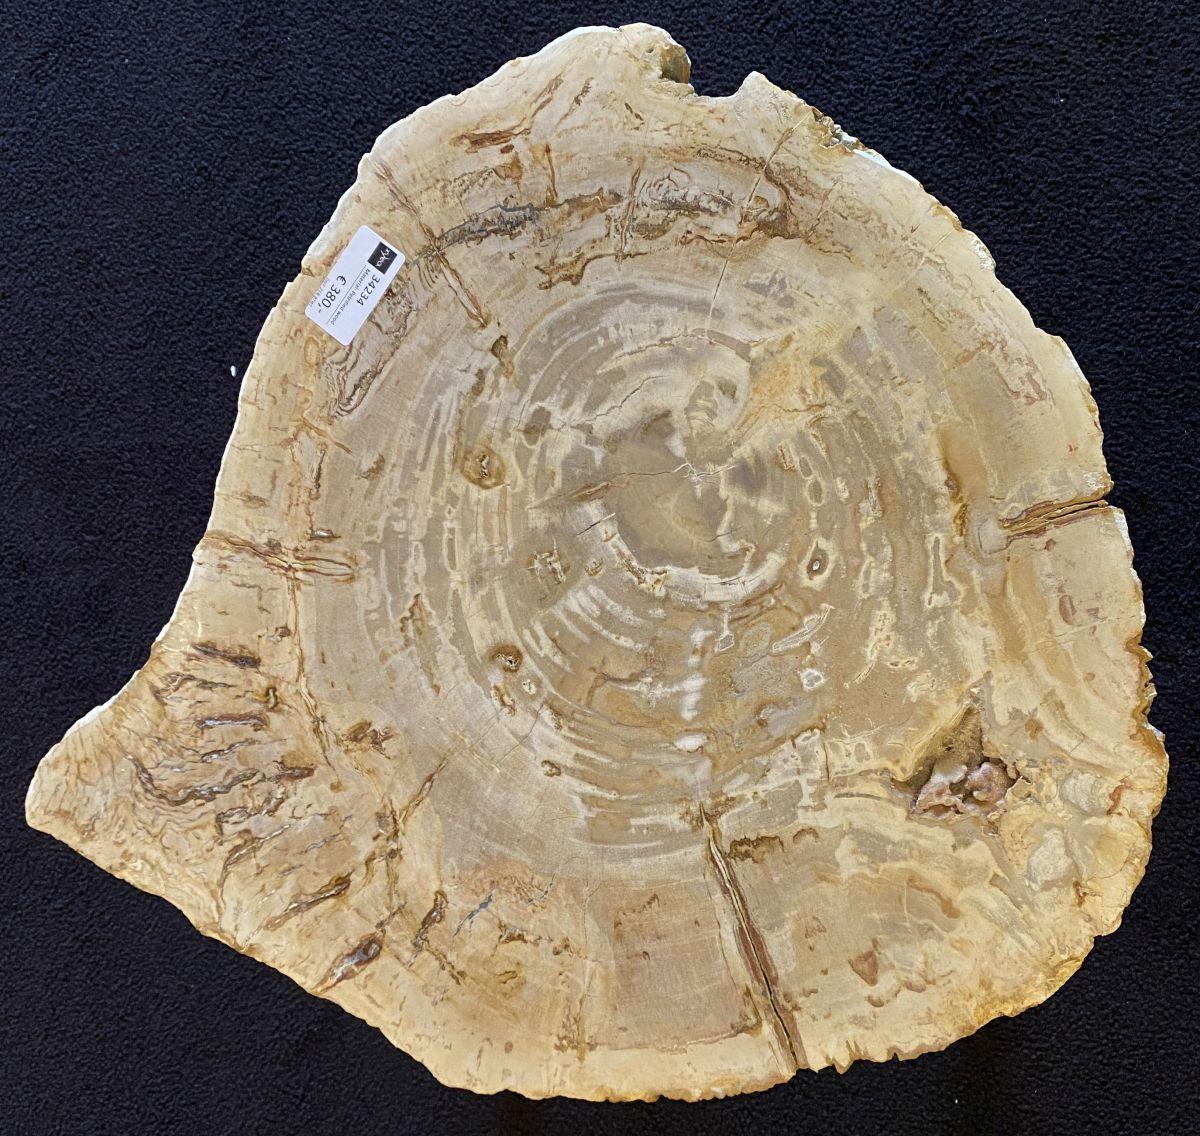 Coffee table petrified wood 34234